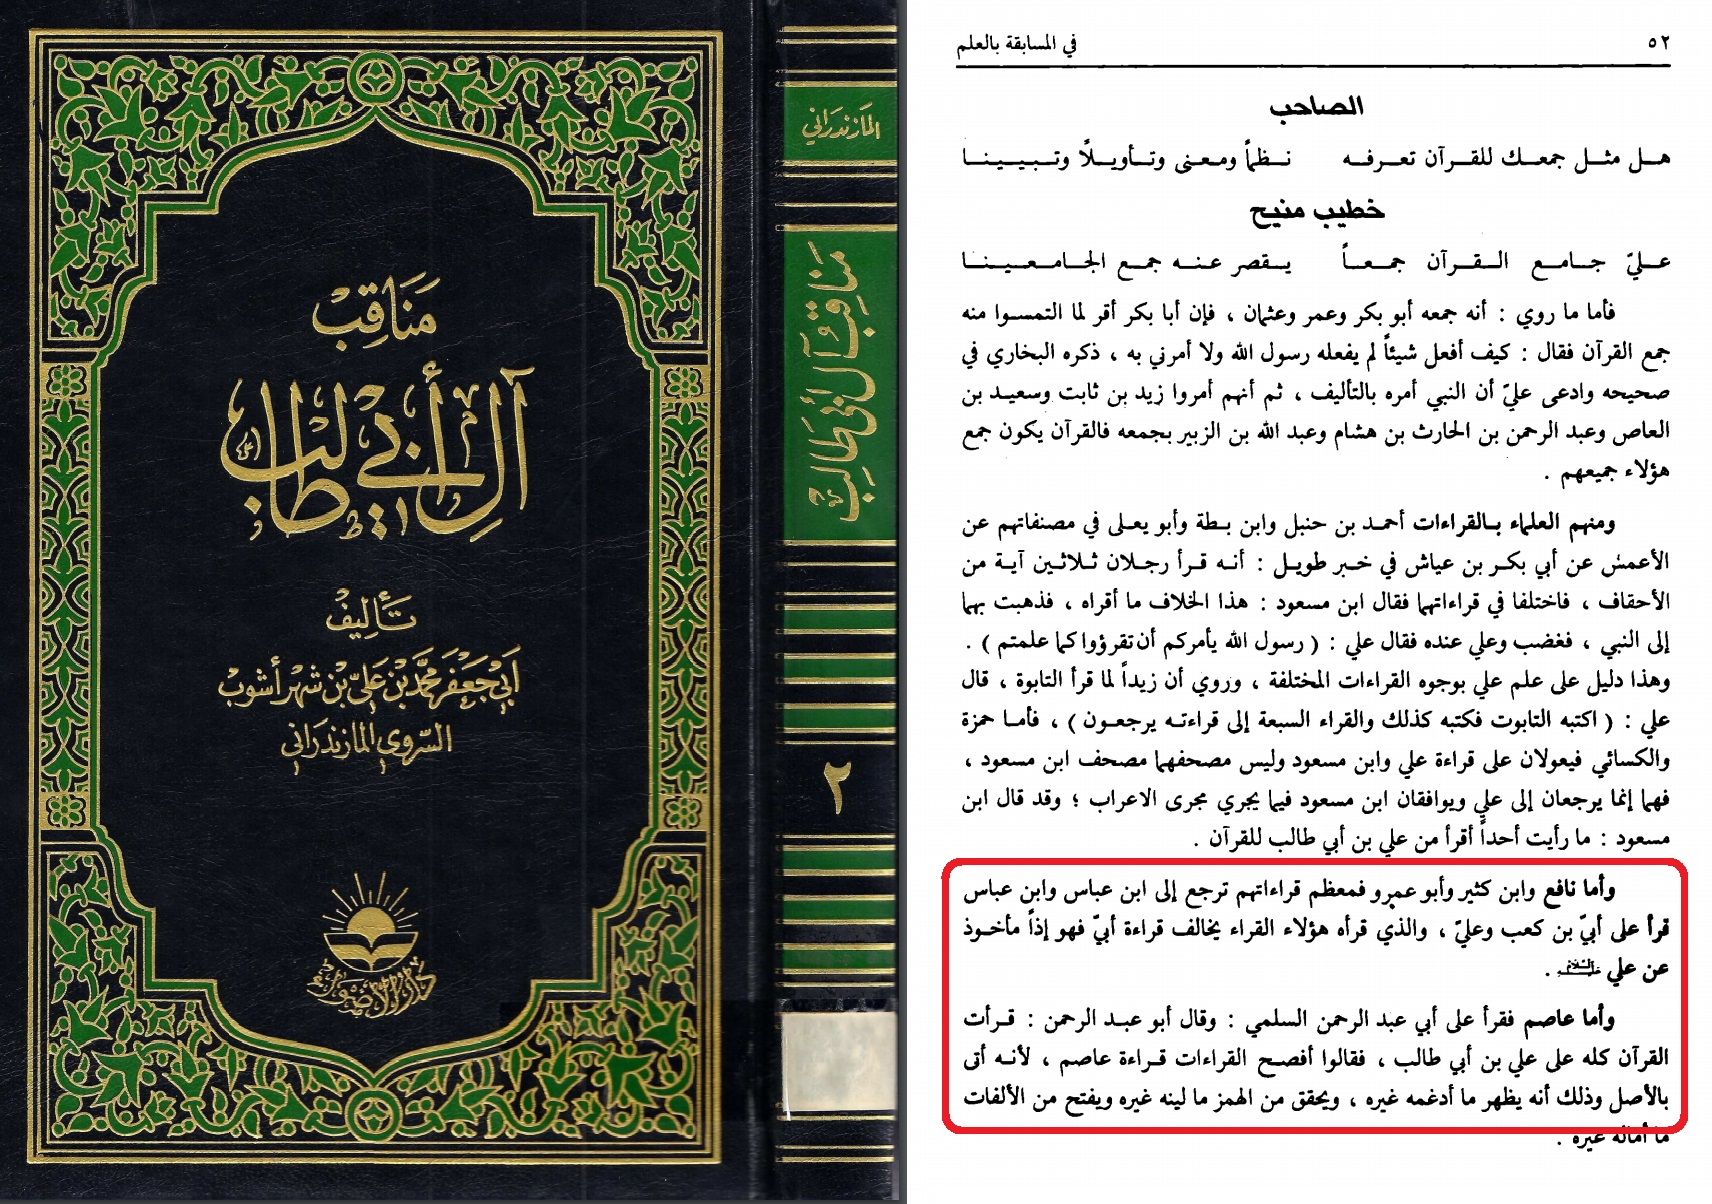 manaqeb-e al-e abu taleb b 2 s 52